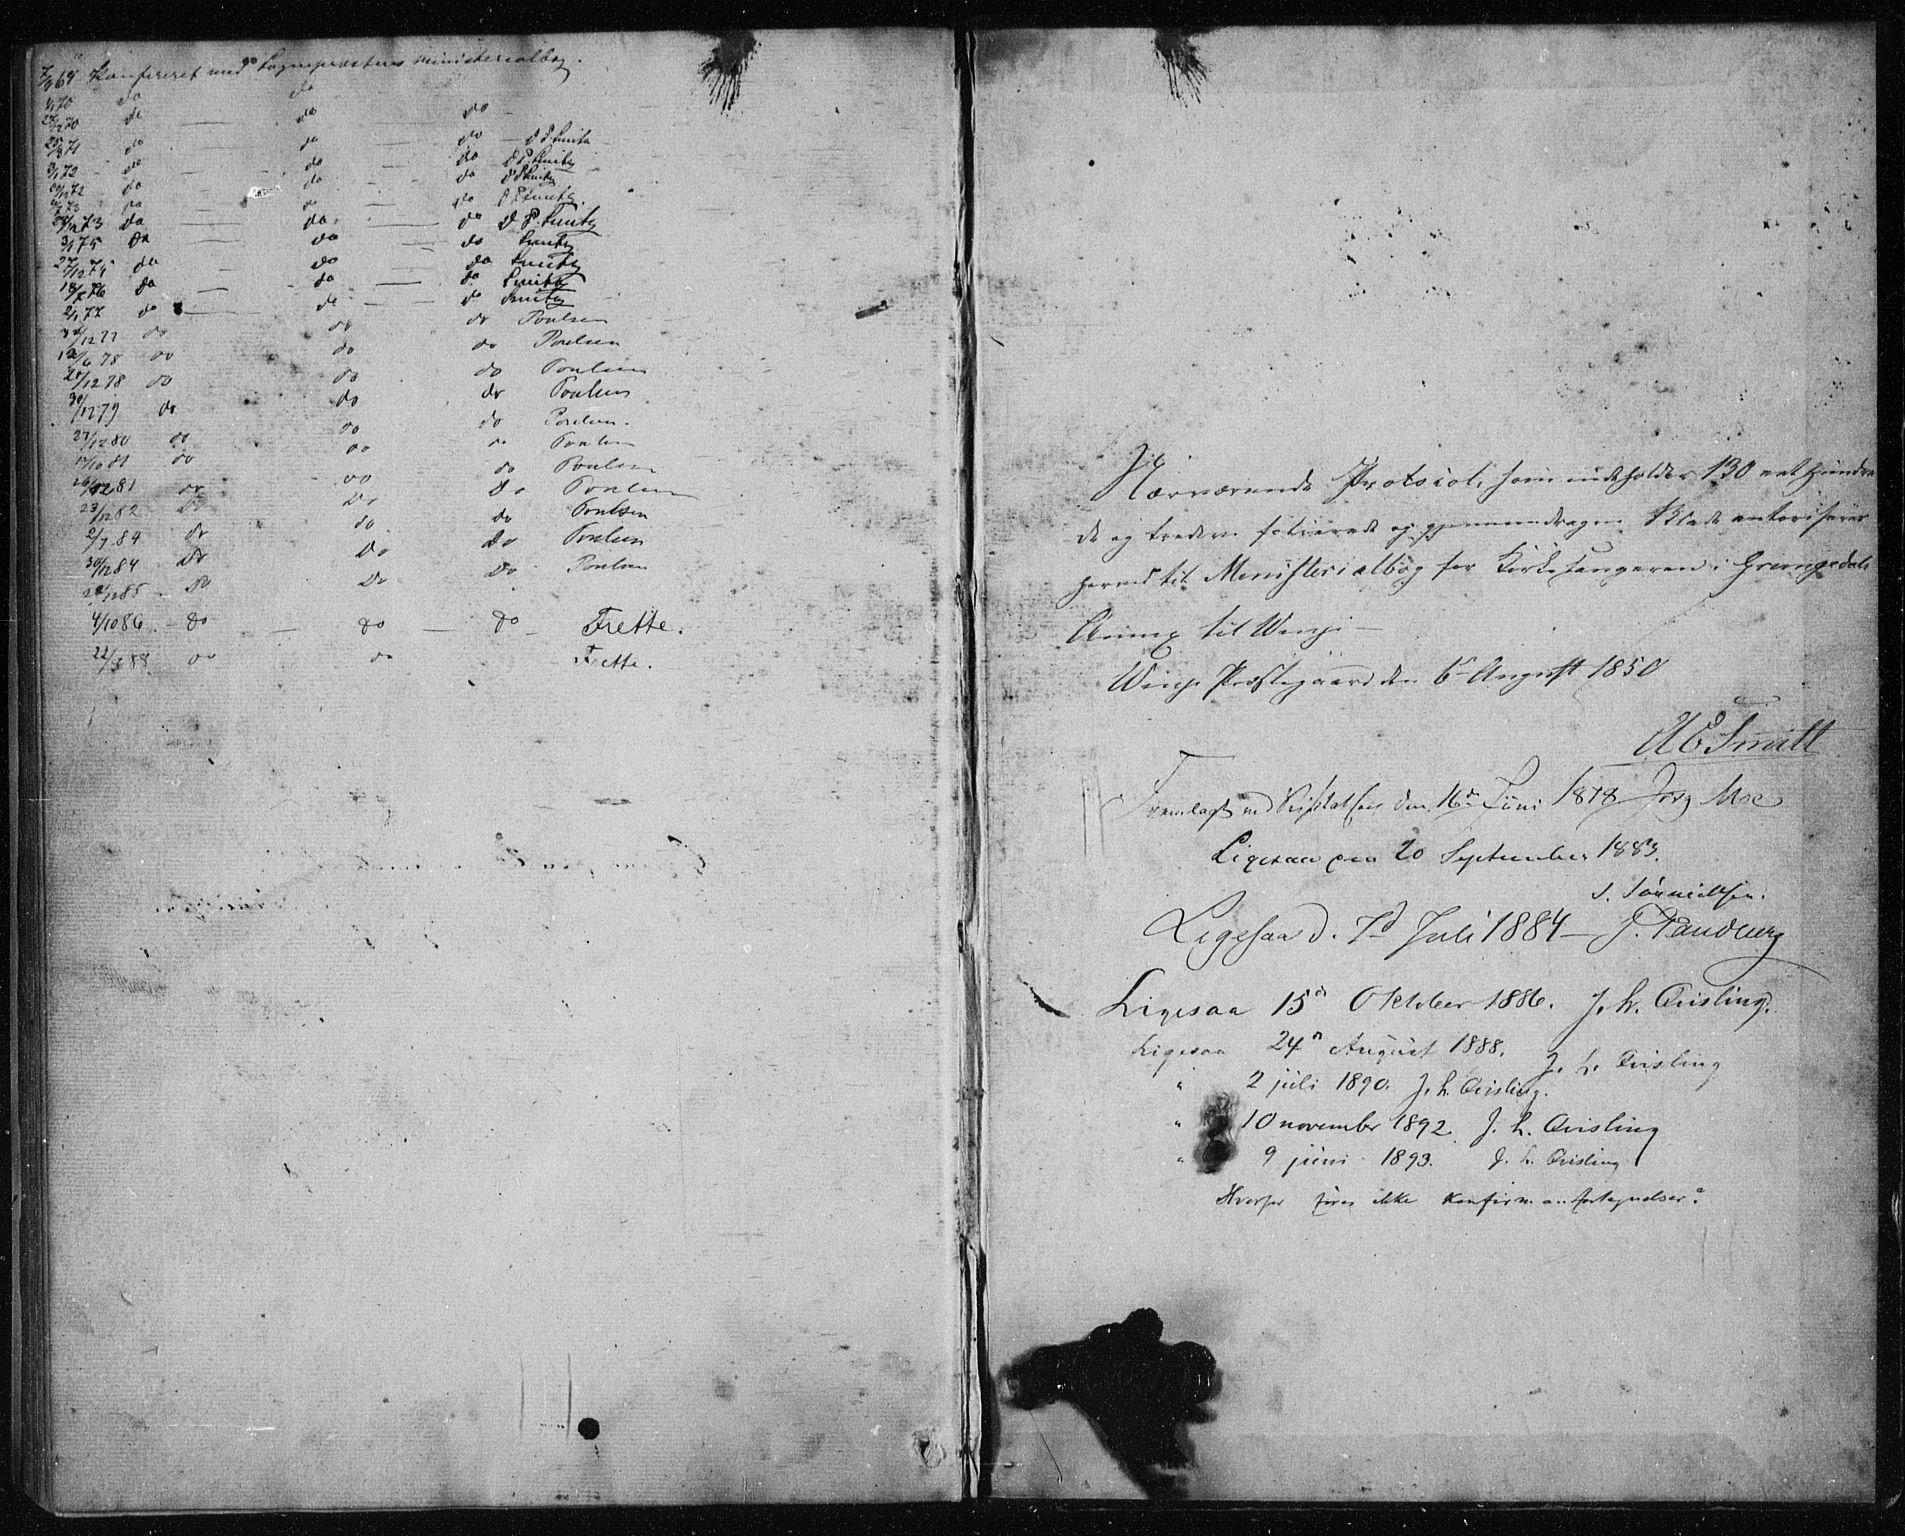 SAKO, Vinje kirkebøker, G/Gc/L0001: Klokkerbok nr. III 1, 1850-1893